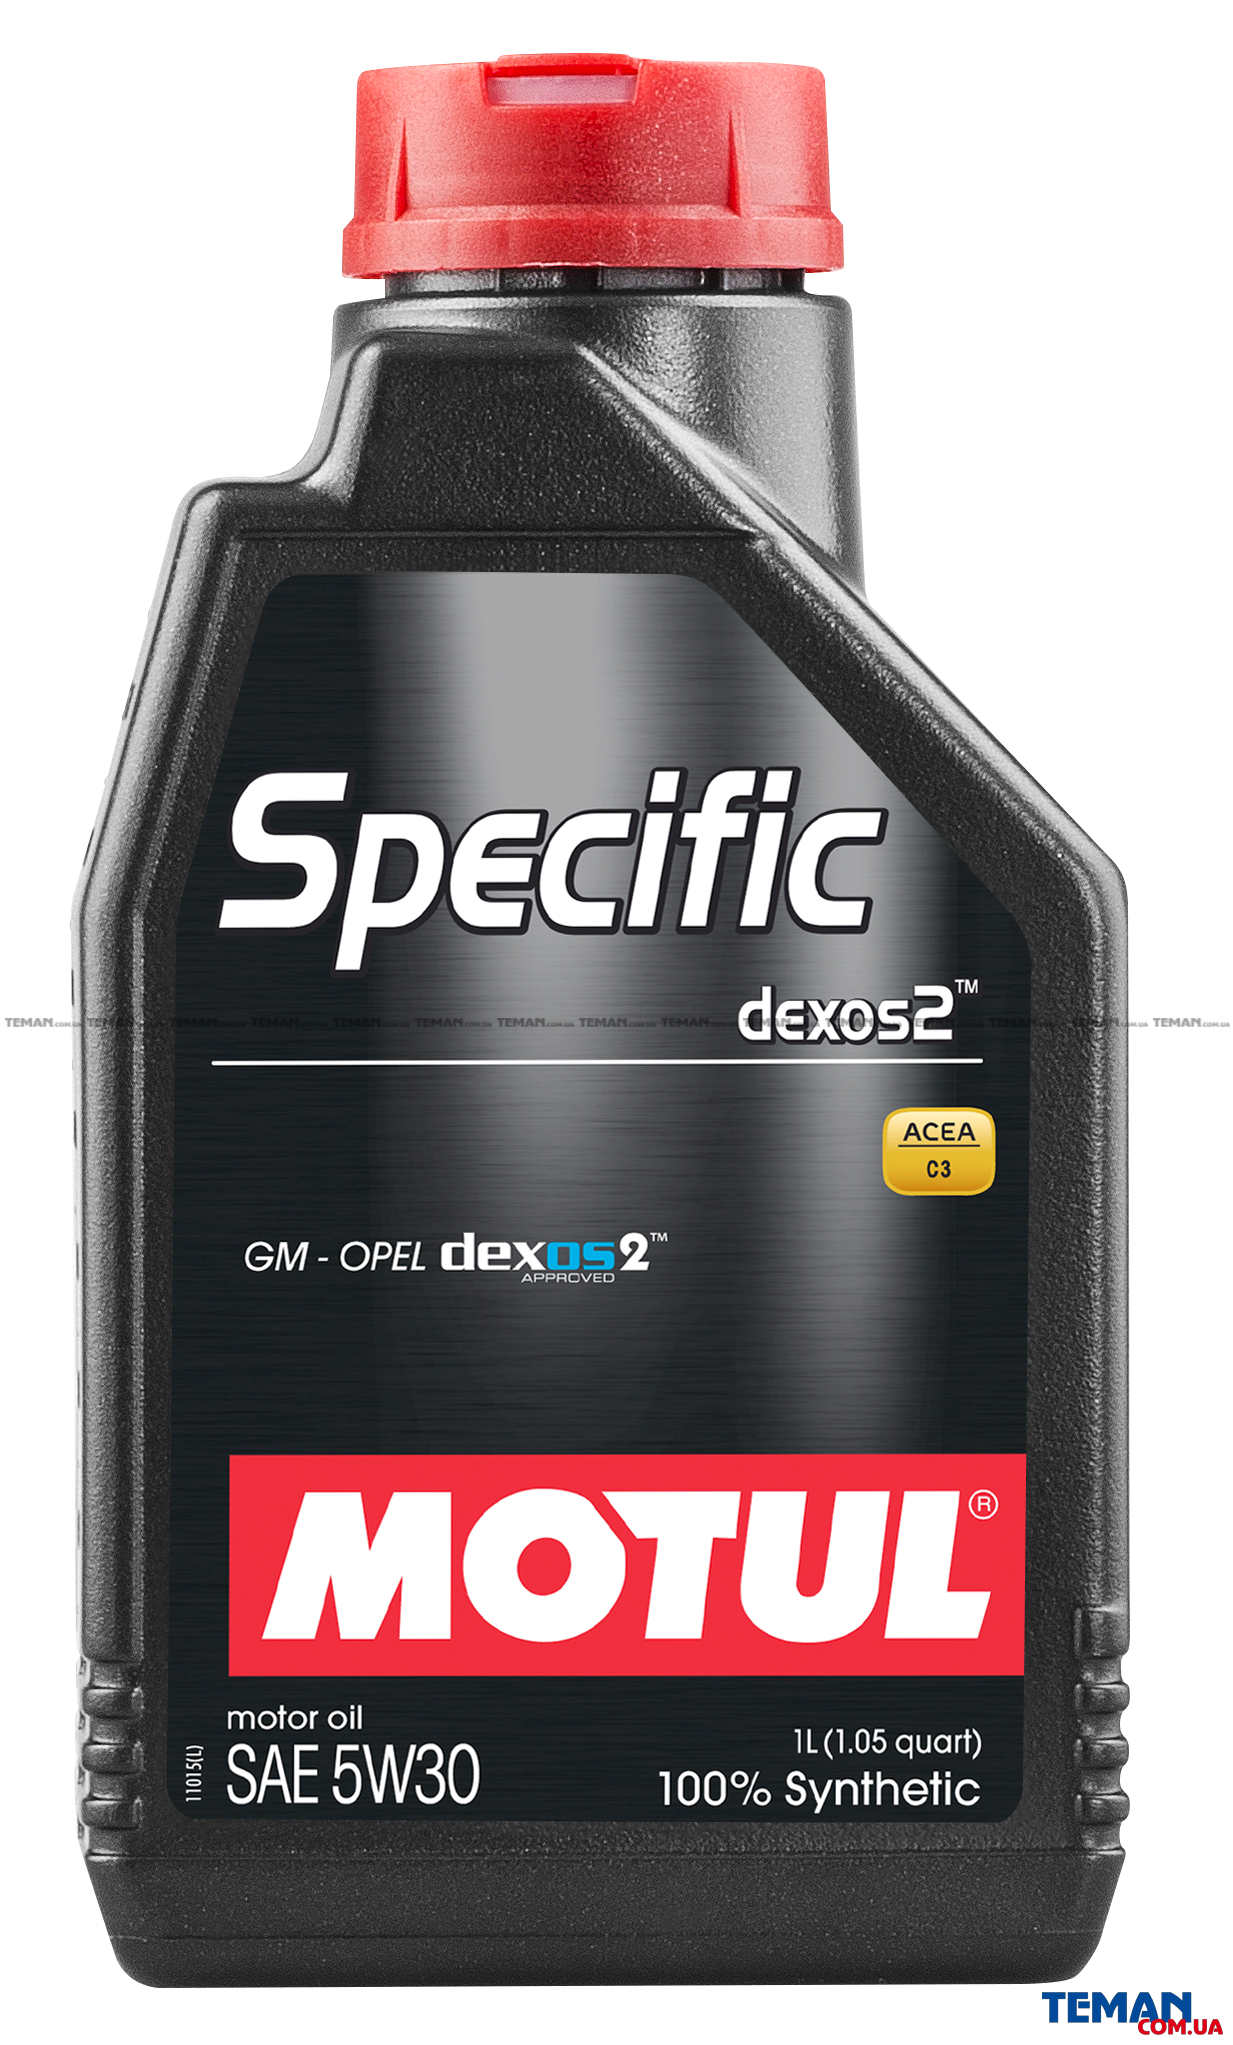 Синтетическое моторное масло SPECIFIC DEXOS2 TM 5W-30, 1 л